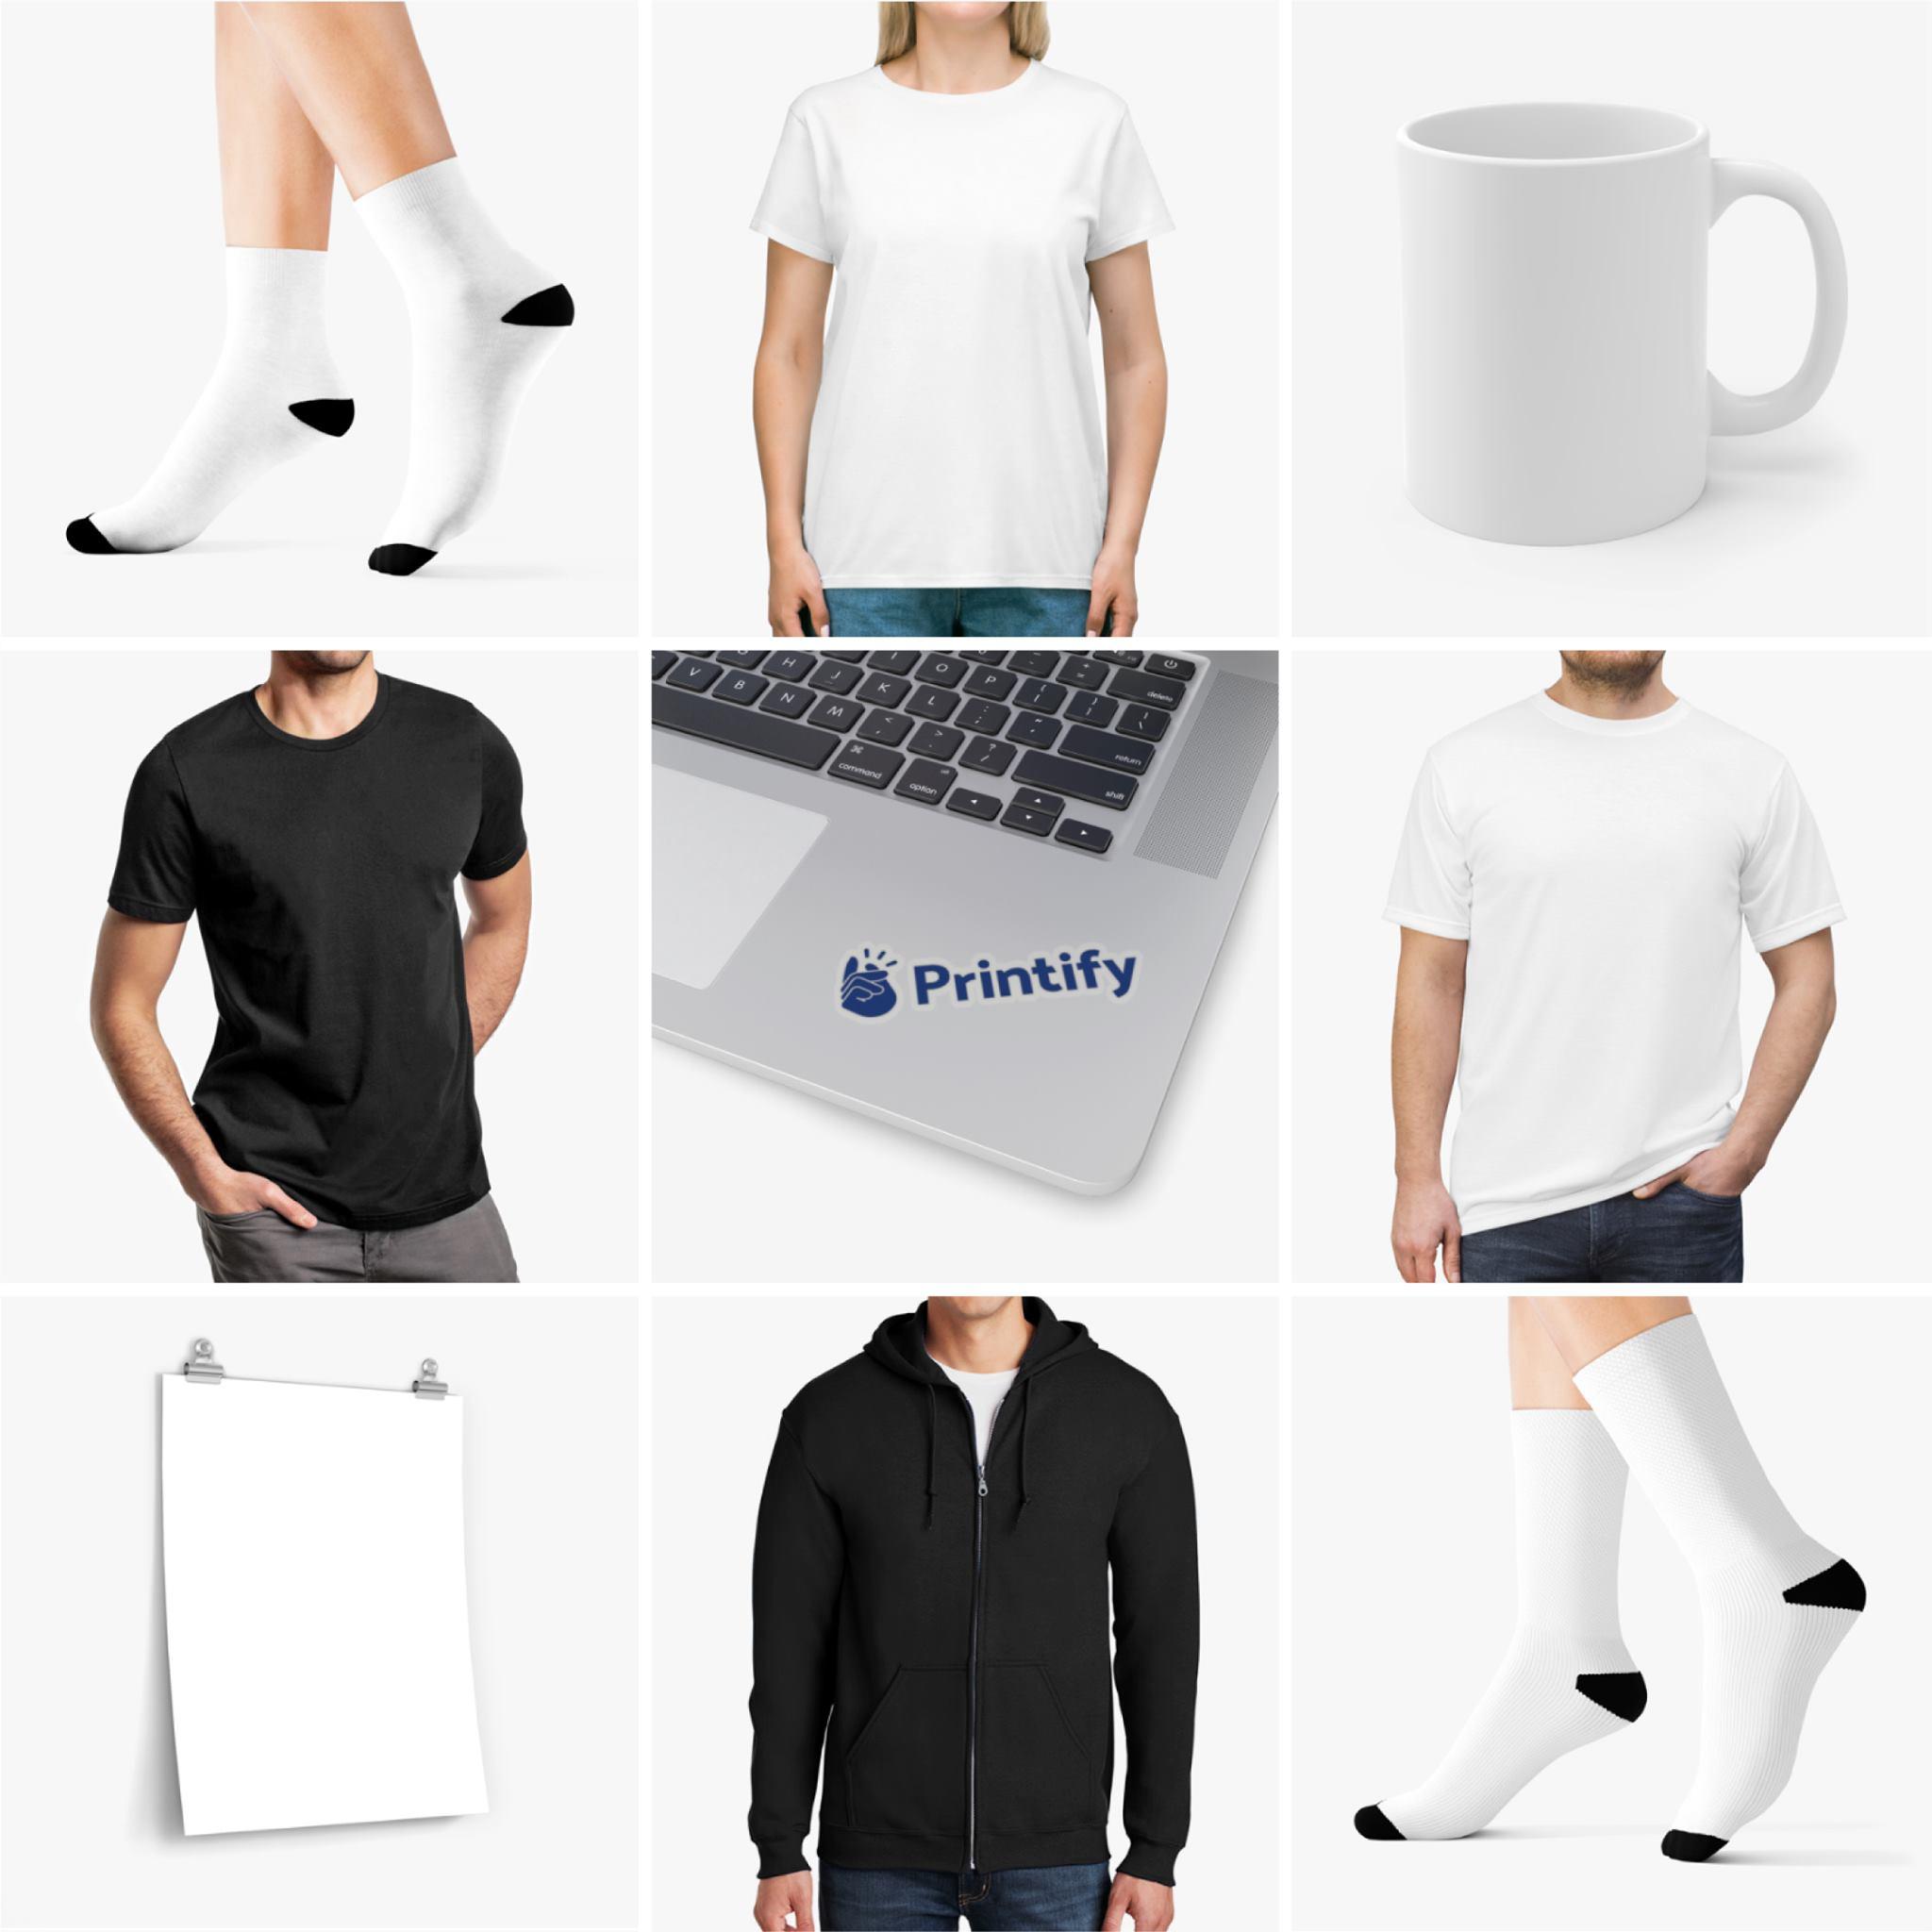 Printify support